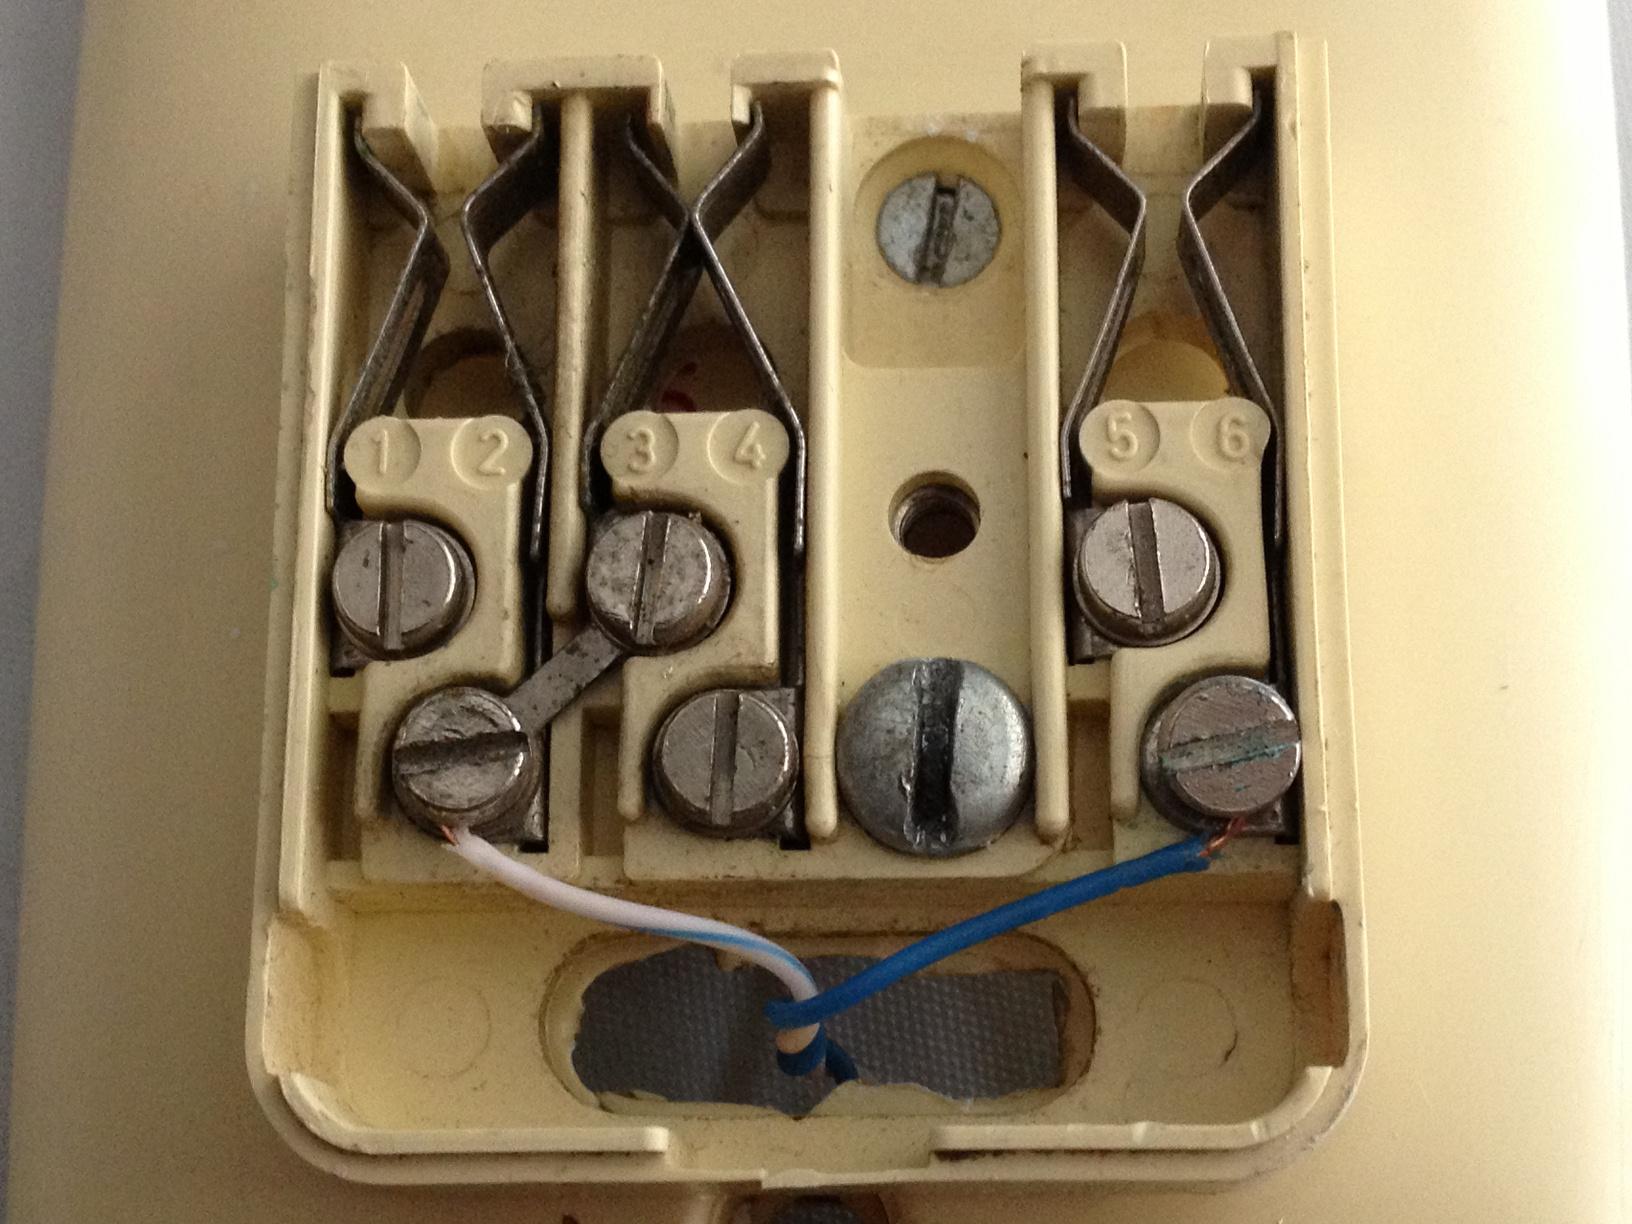 Wiring Diagram For Telephone Socket Australia Wiring Diagram Schema